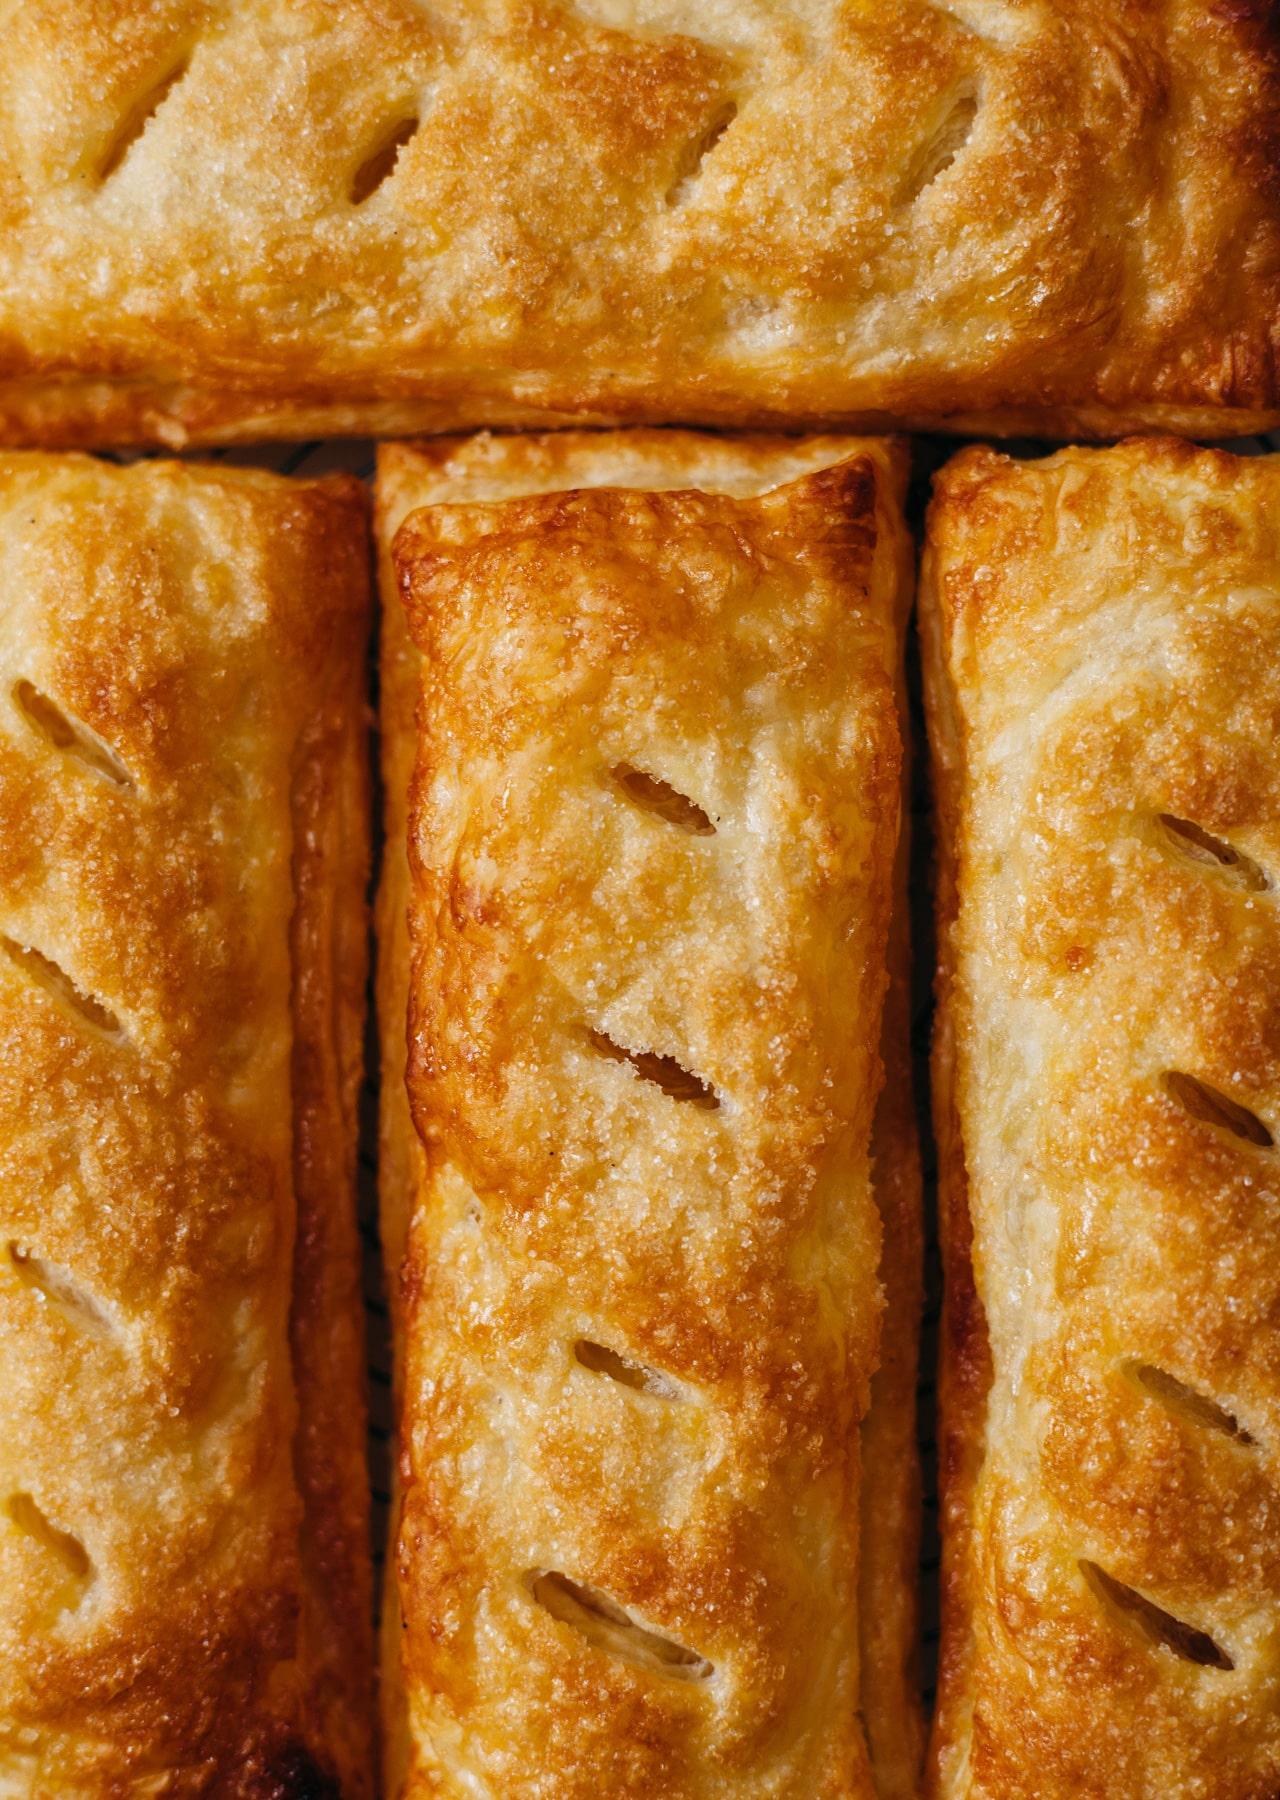 Vegan Homemade McDonald's Apple Pies Recipe